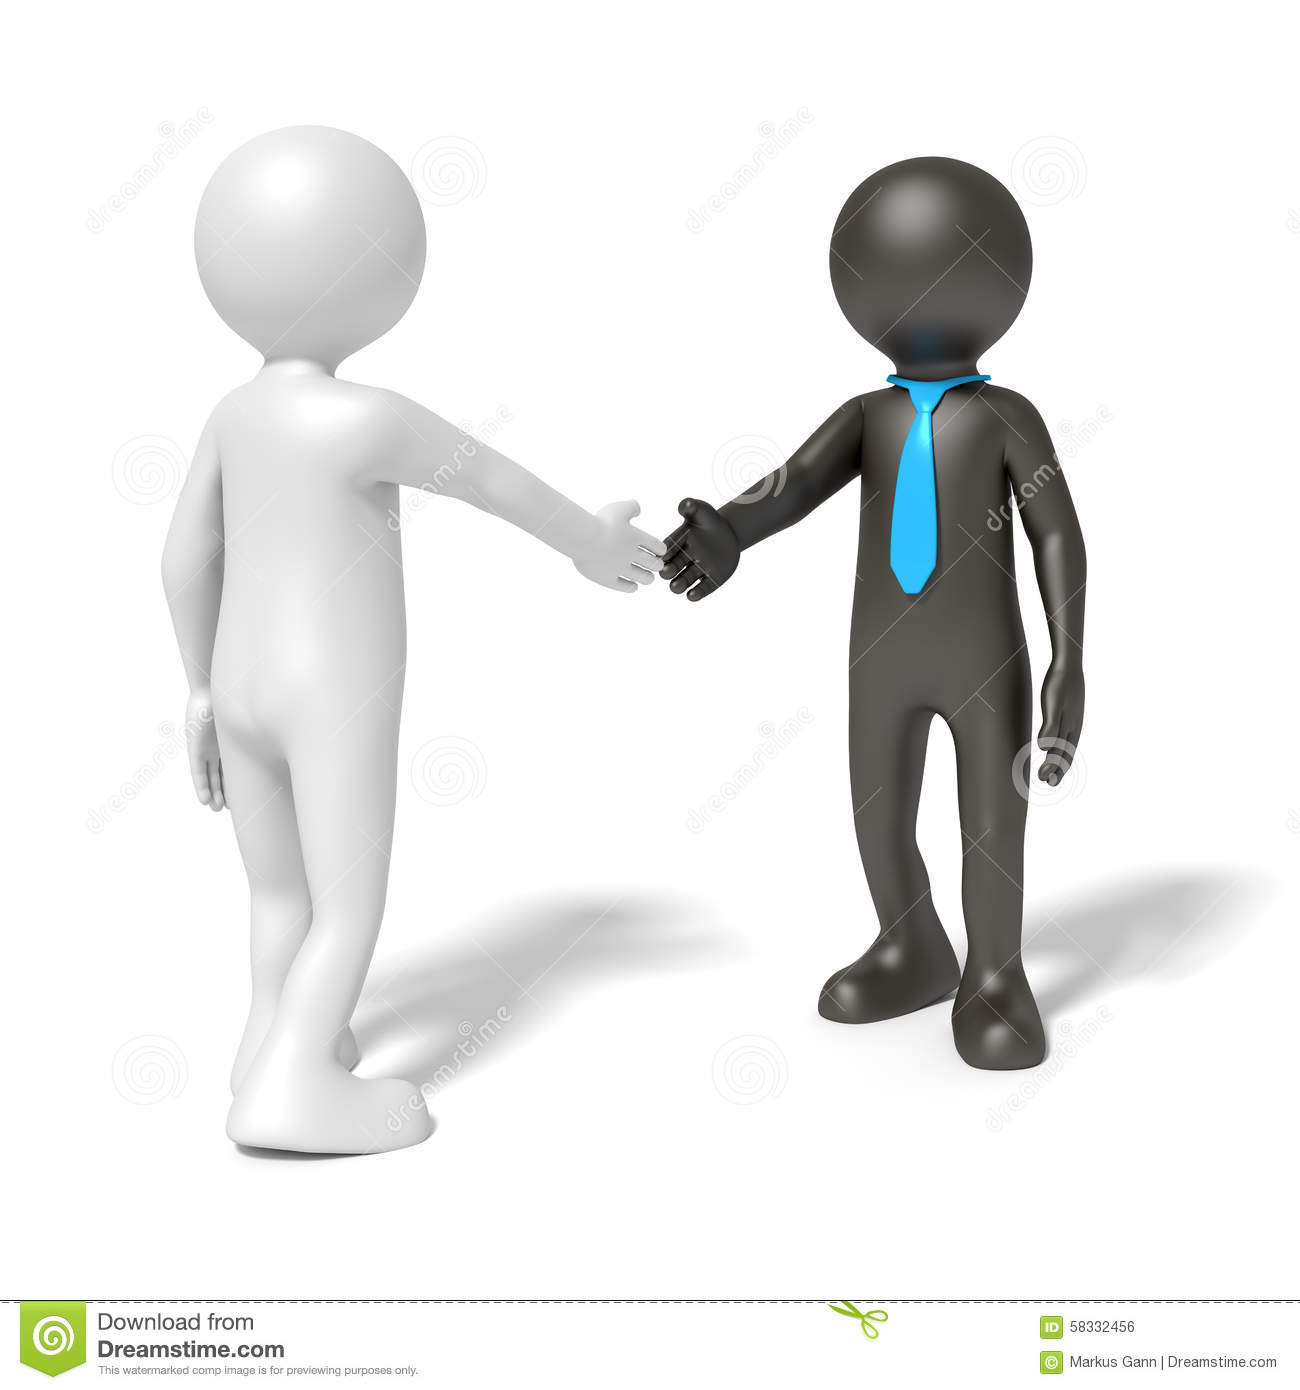 Serrer la main clipart clip art royalty free download Clipart Business Deal Handshake In Black And White Royalty Free ... clip art royalty free download